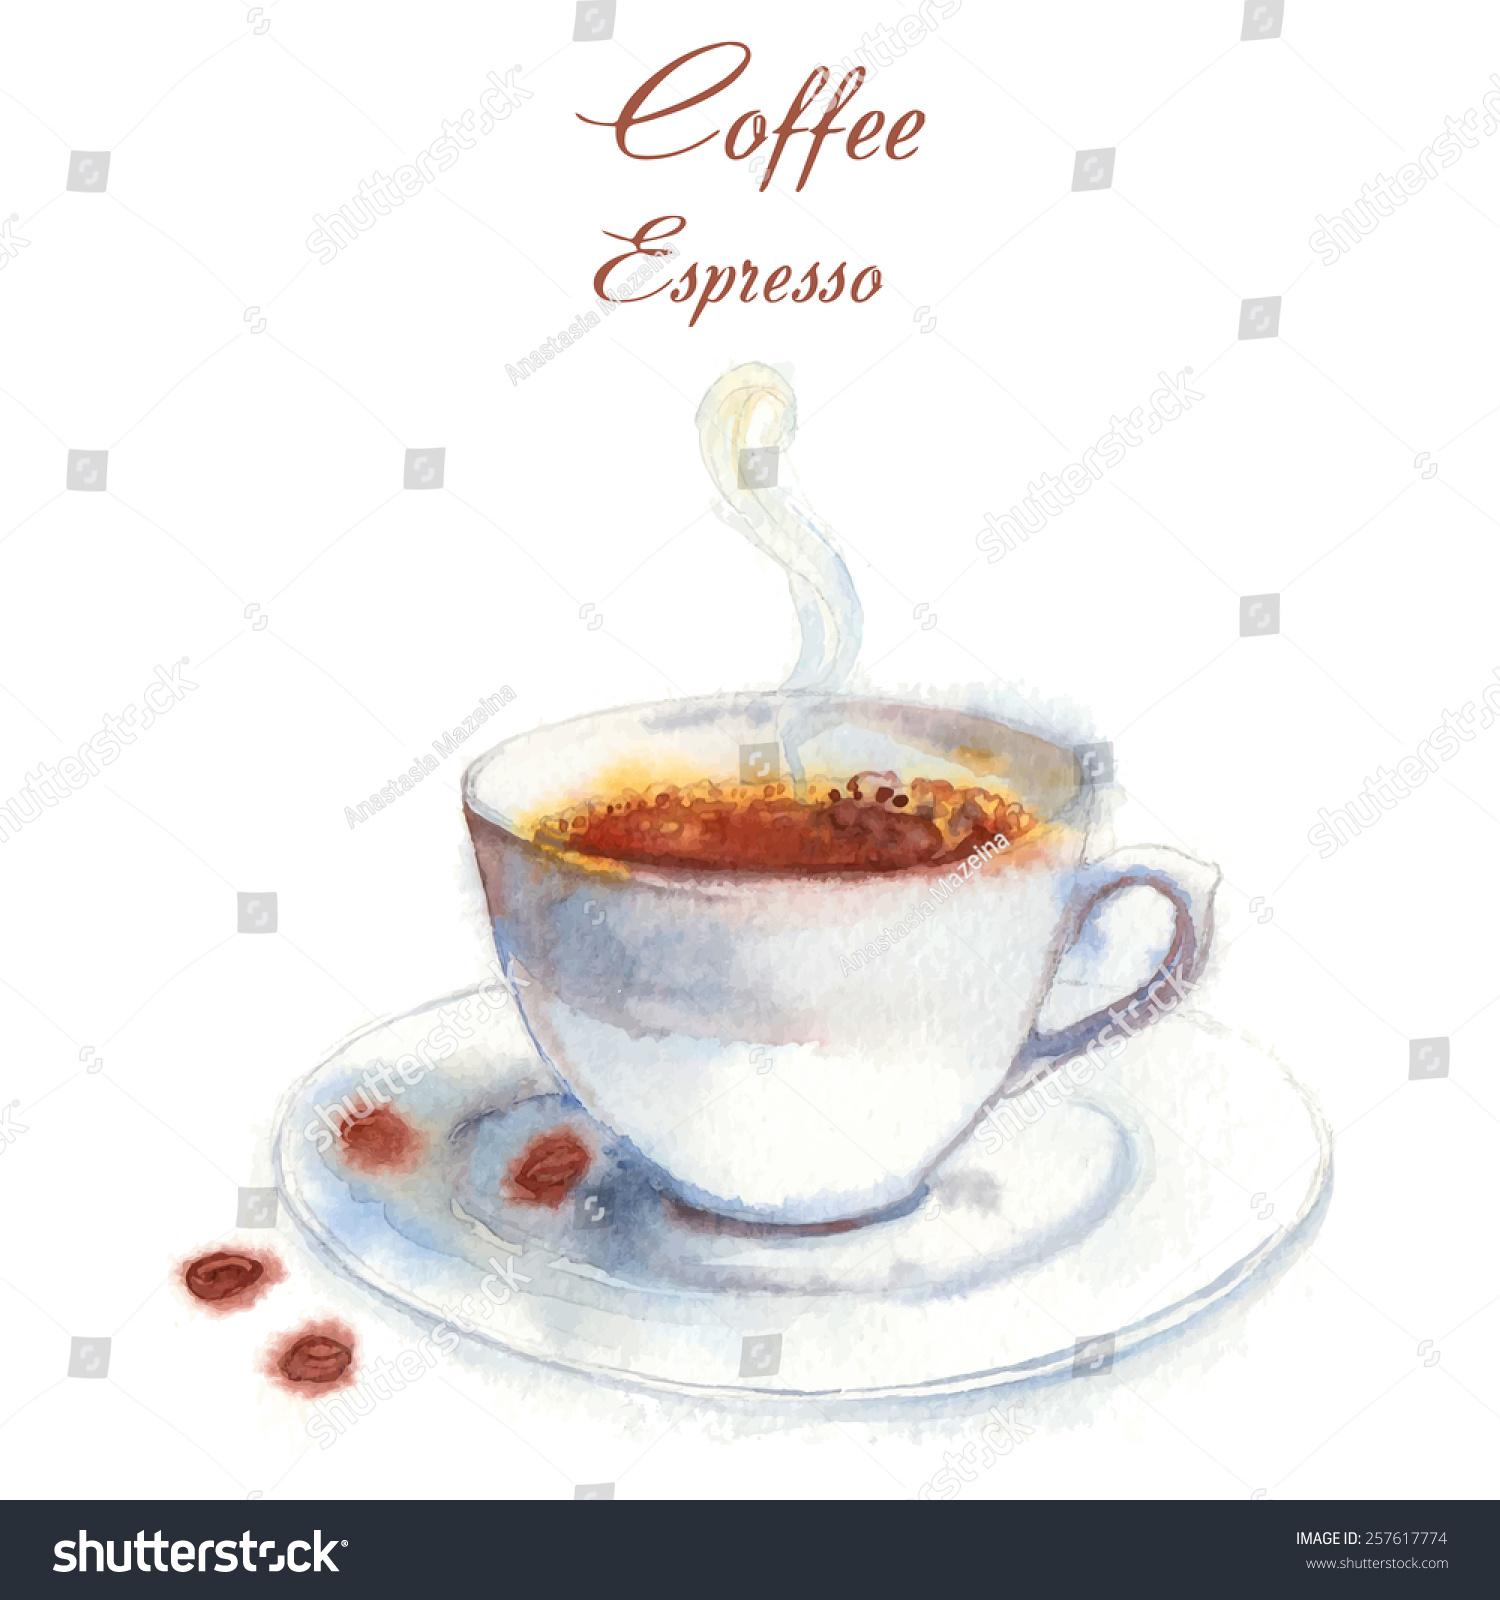 Hand drawn vector watercolorstyle espresso coffee stock for Coffee watercolor